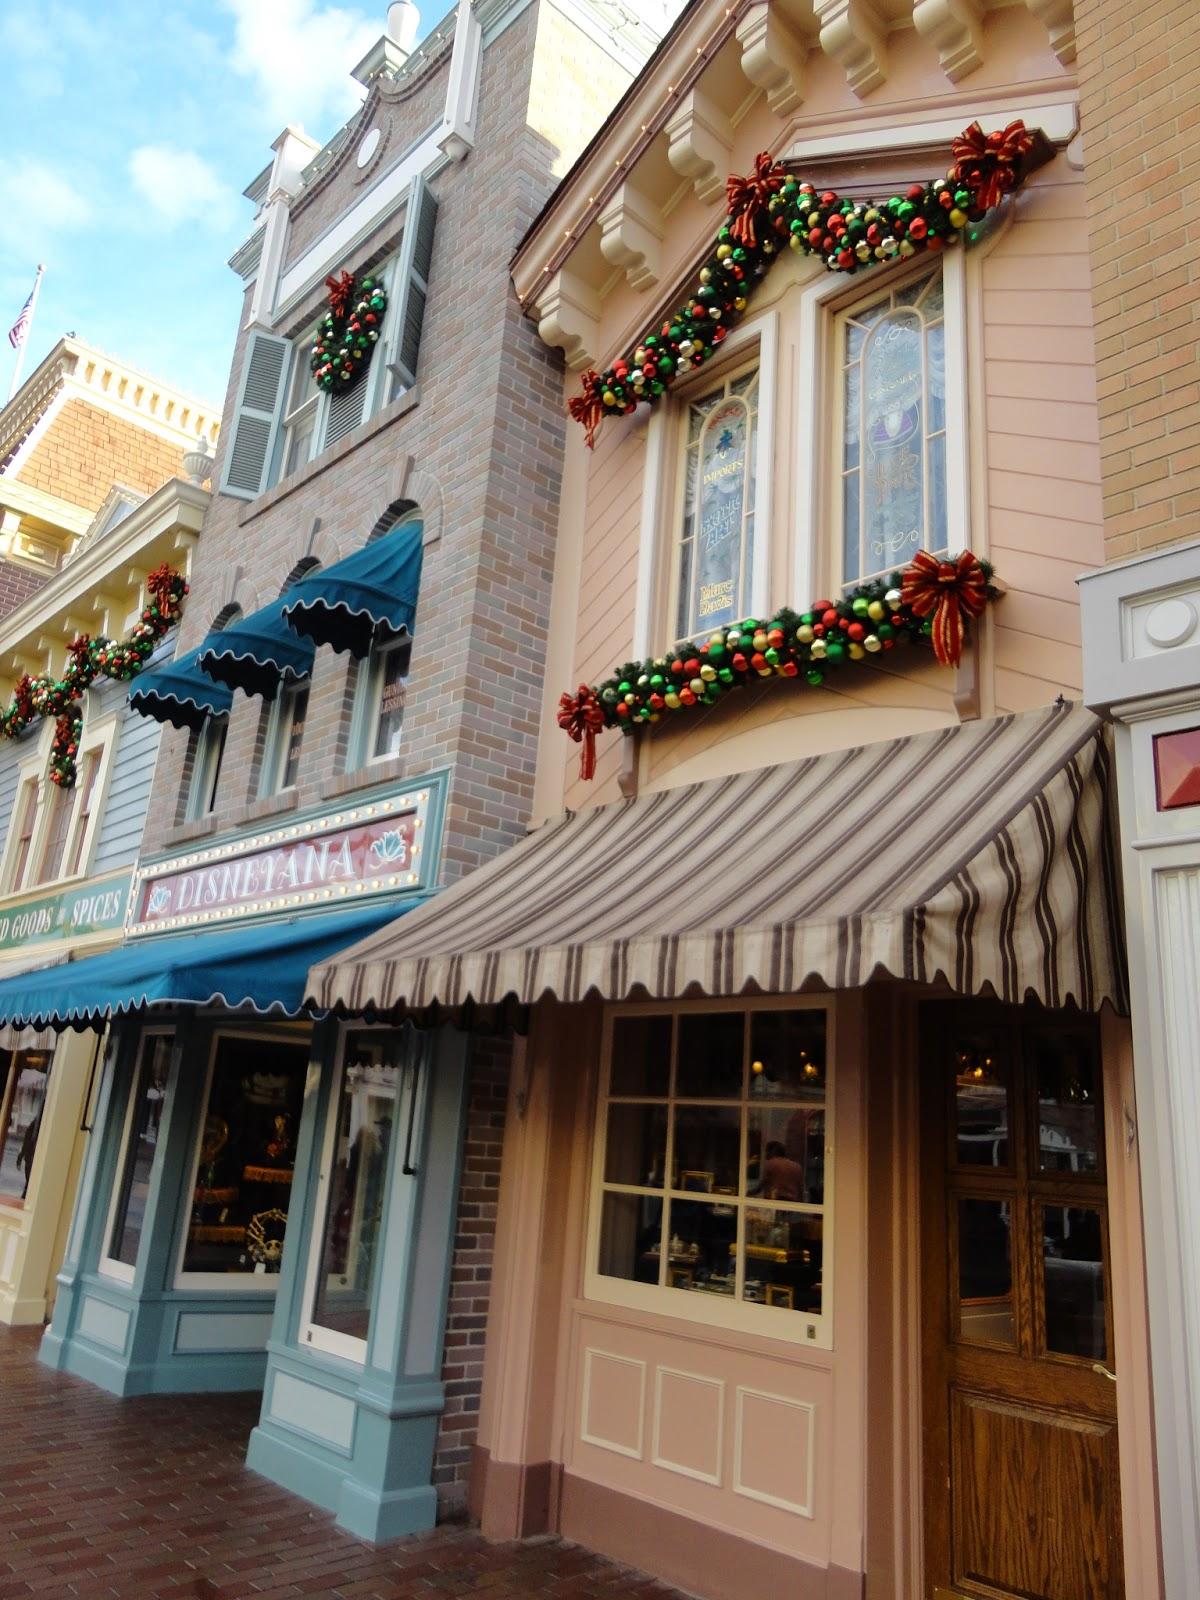 Disneyland: Main Street Disneyana Building